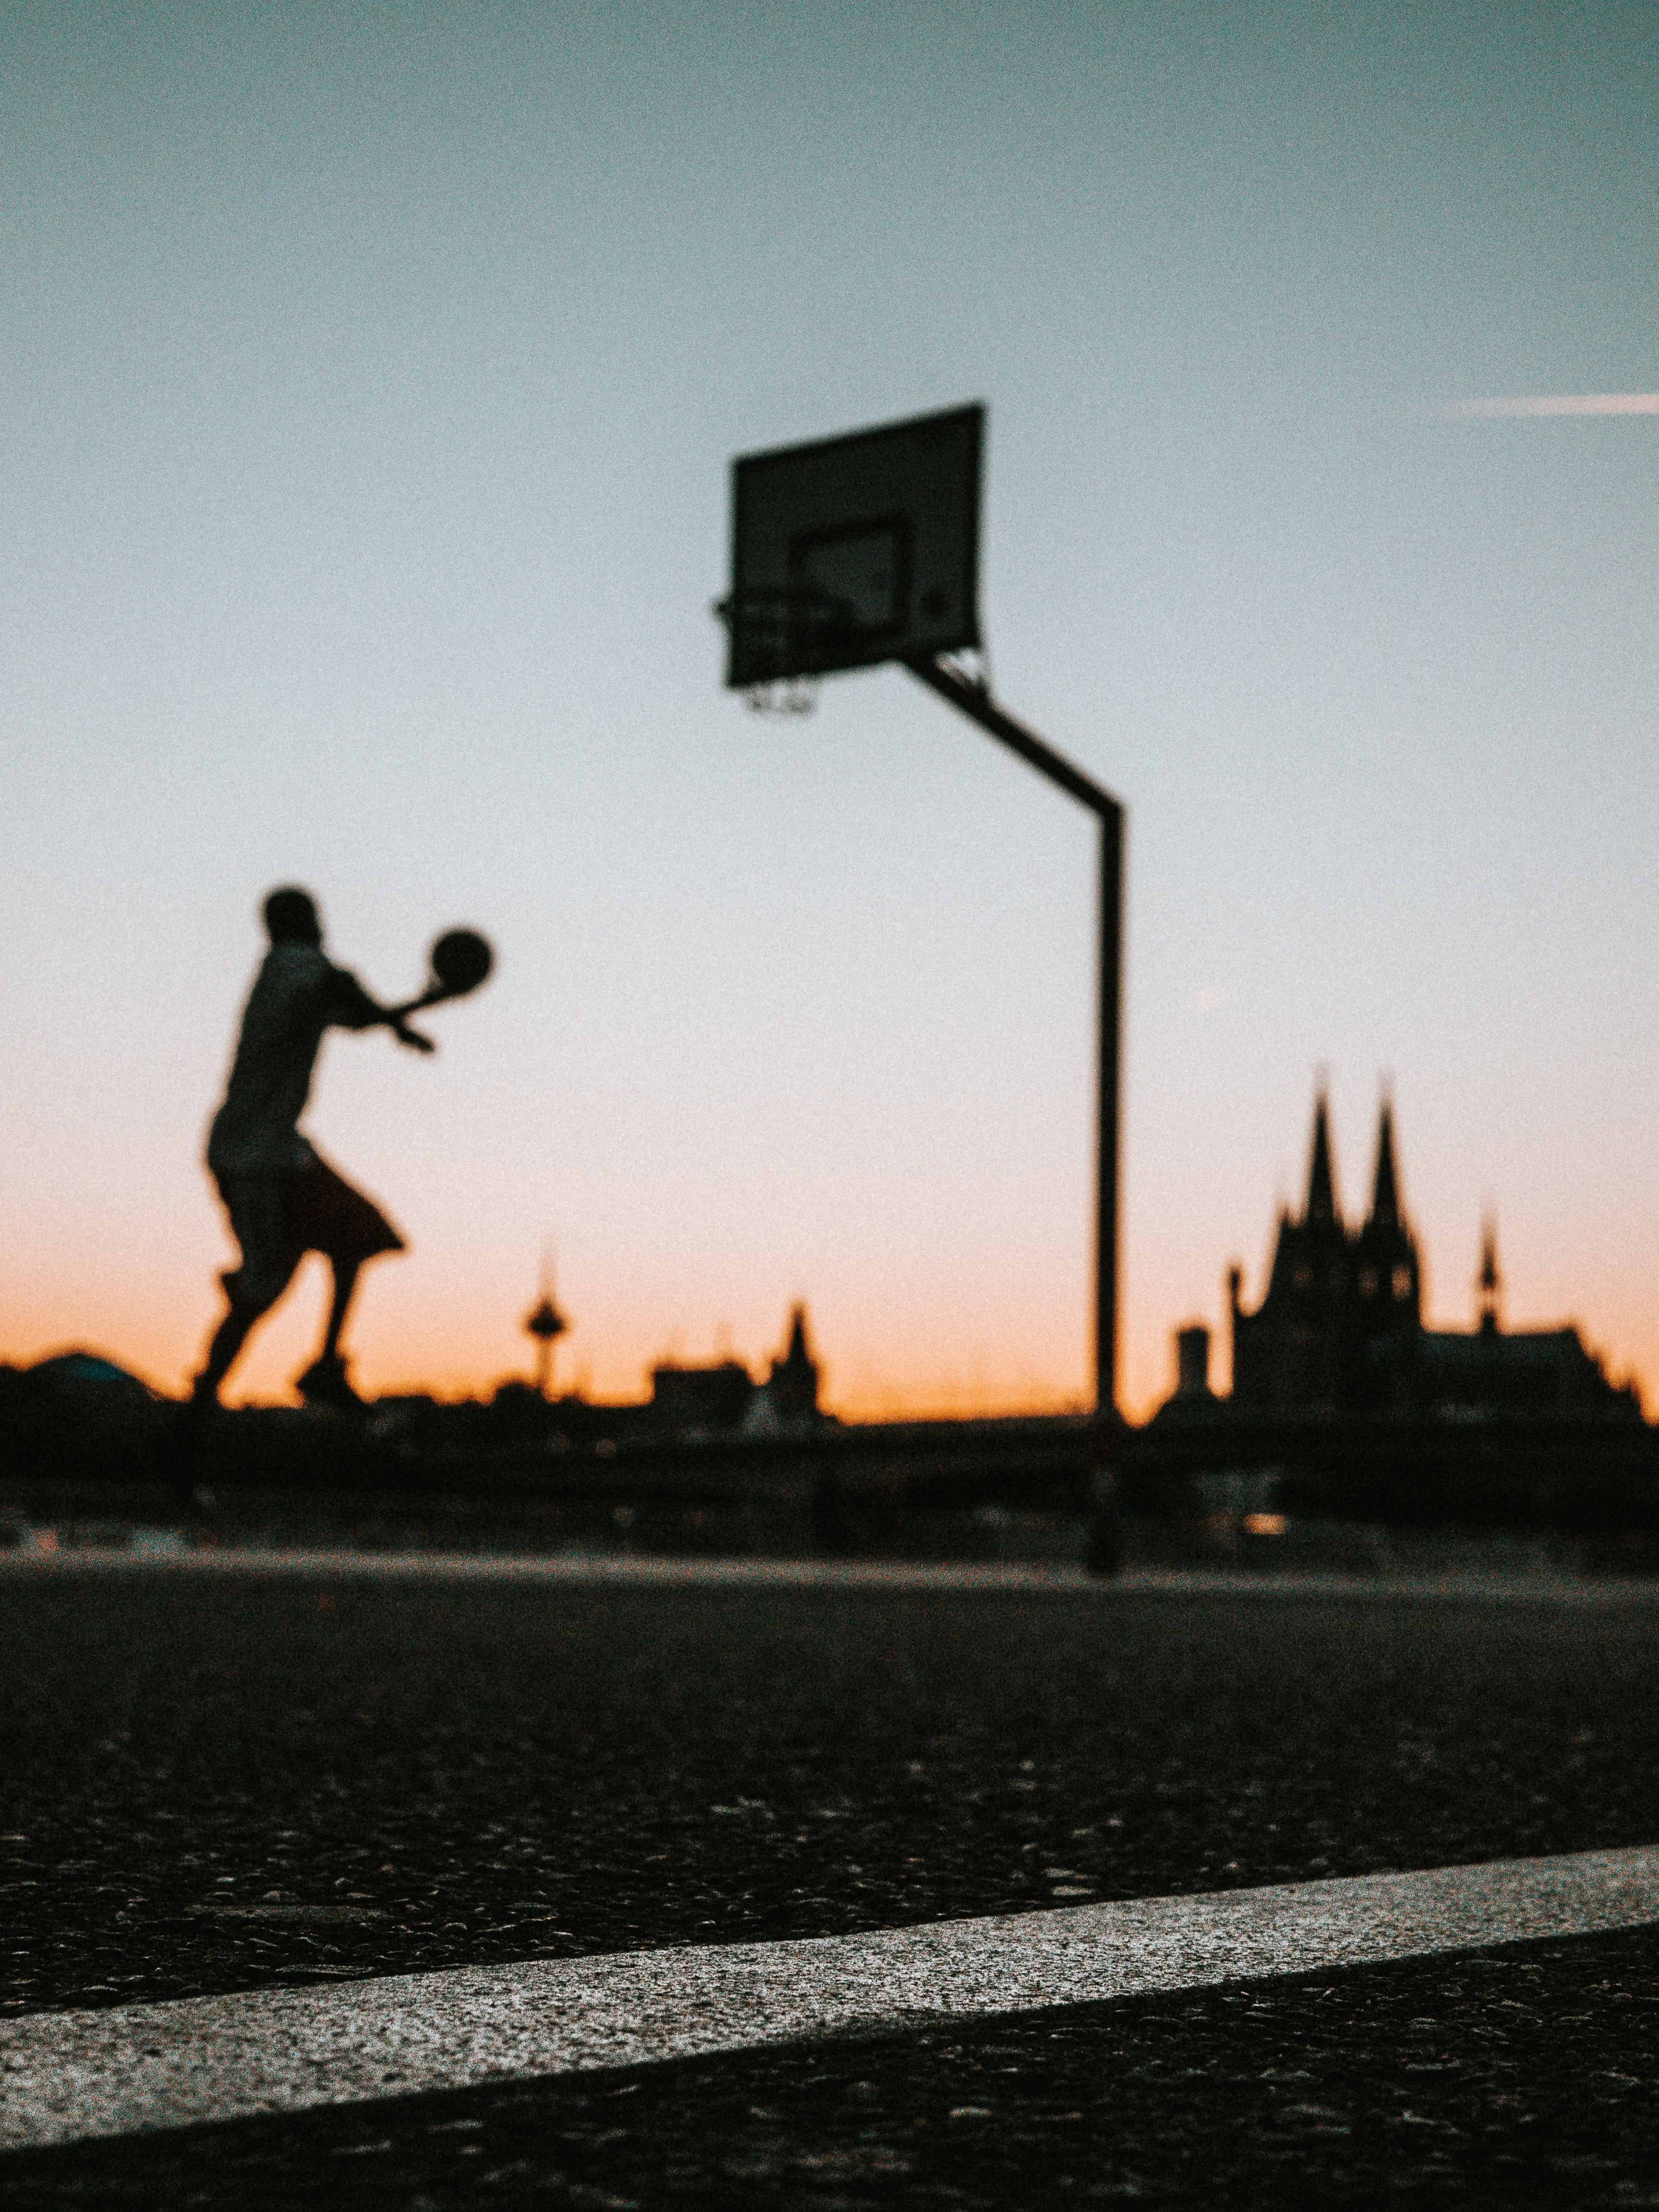 man holding ball jumping near portable basketball hoop